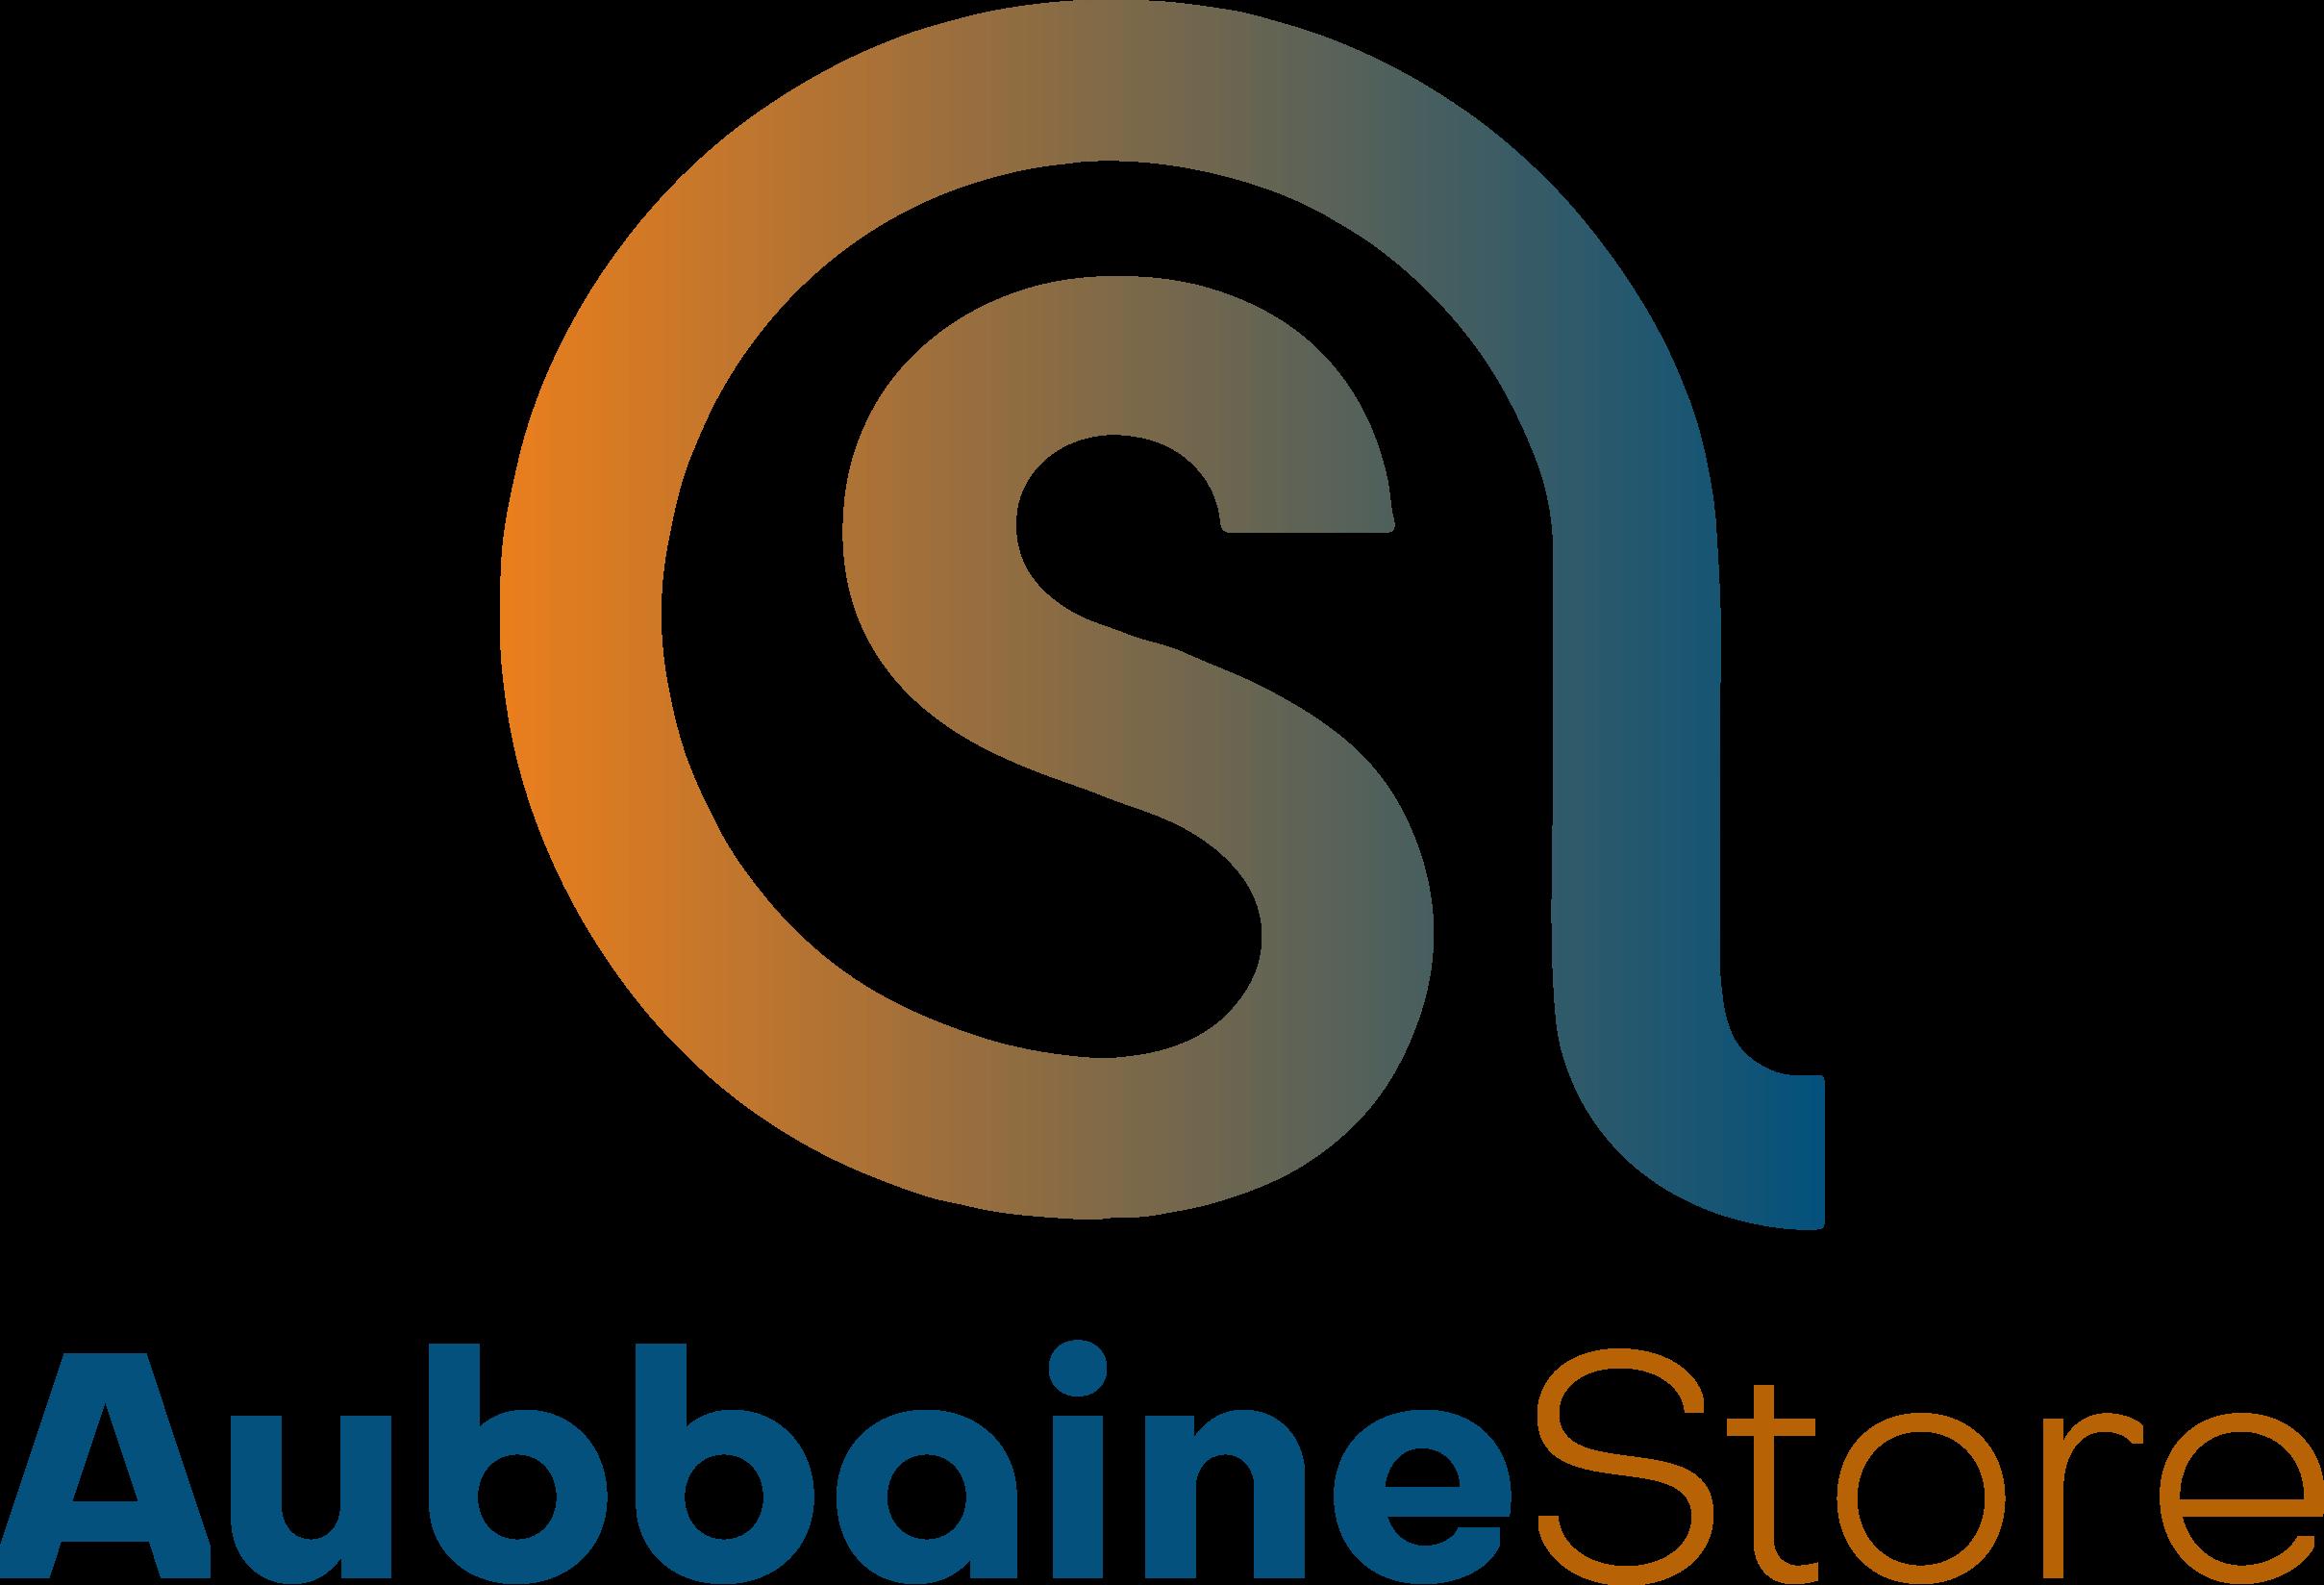 Aubbaine